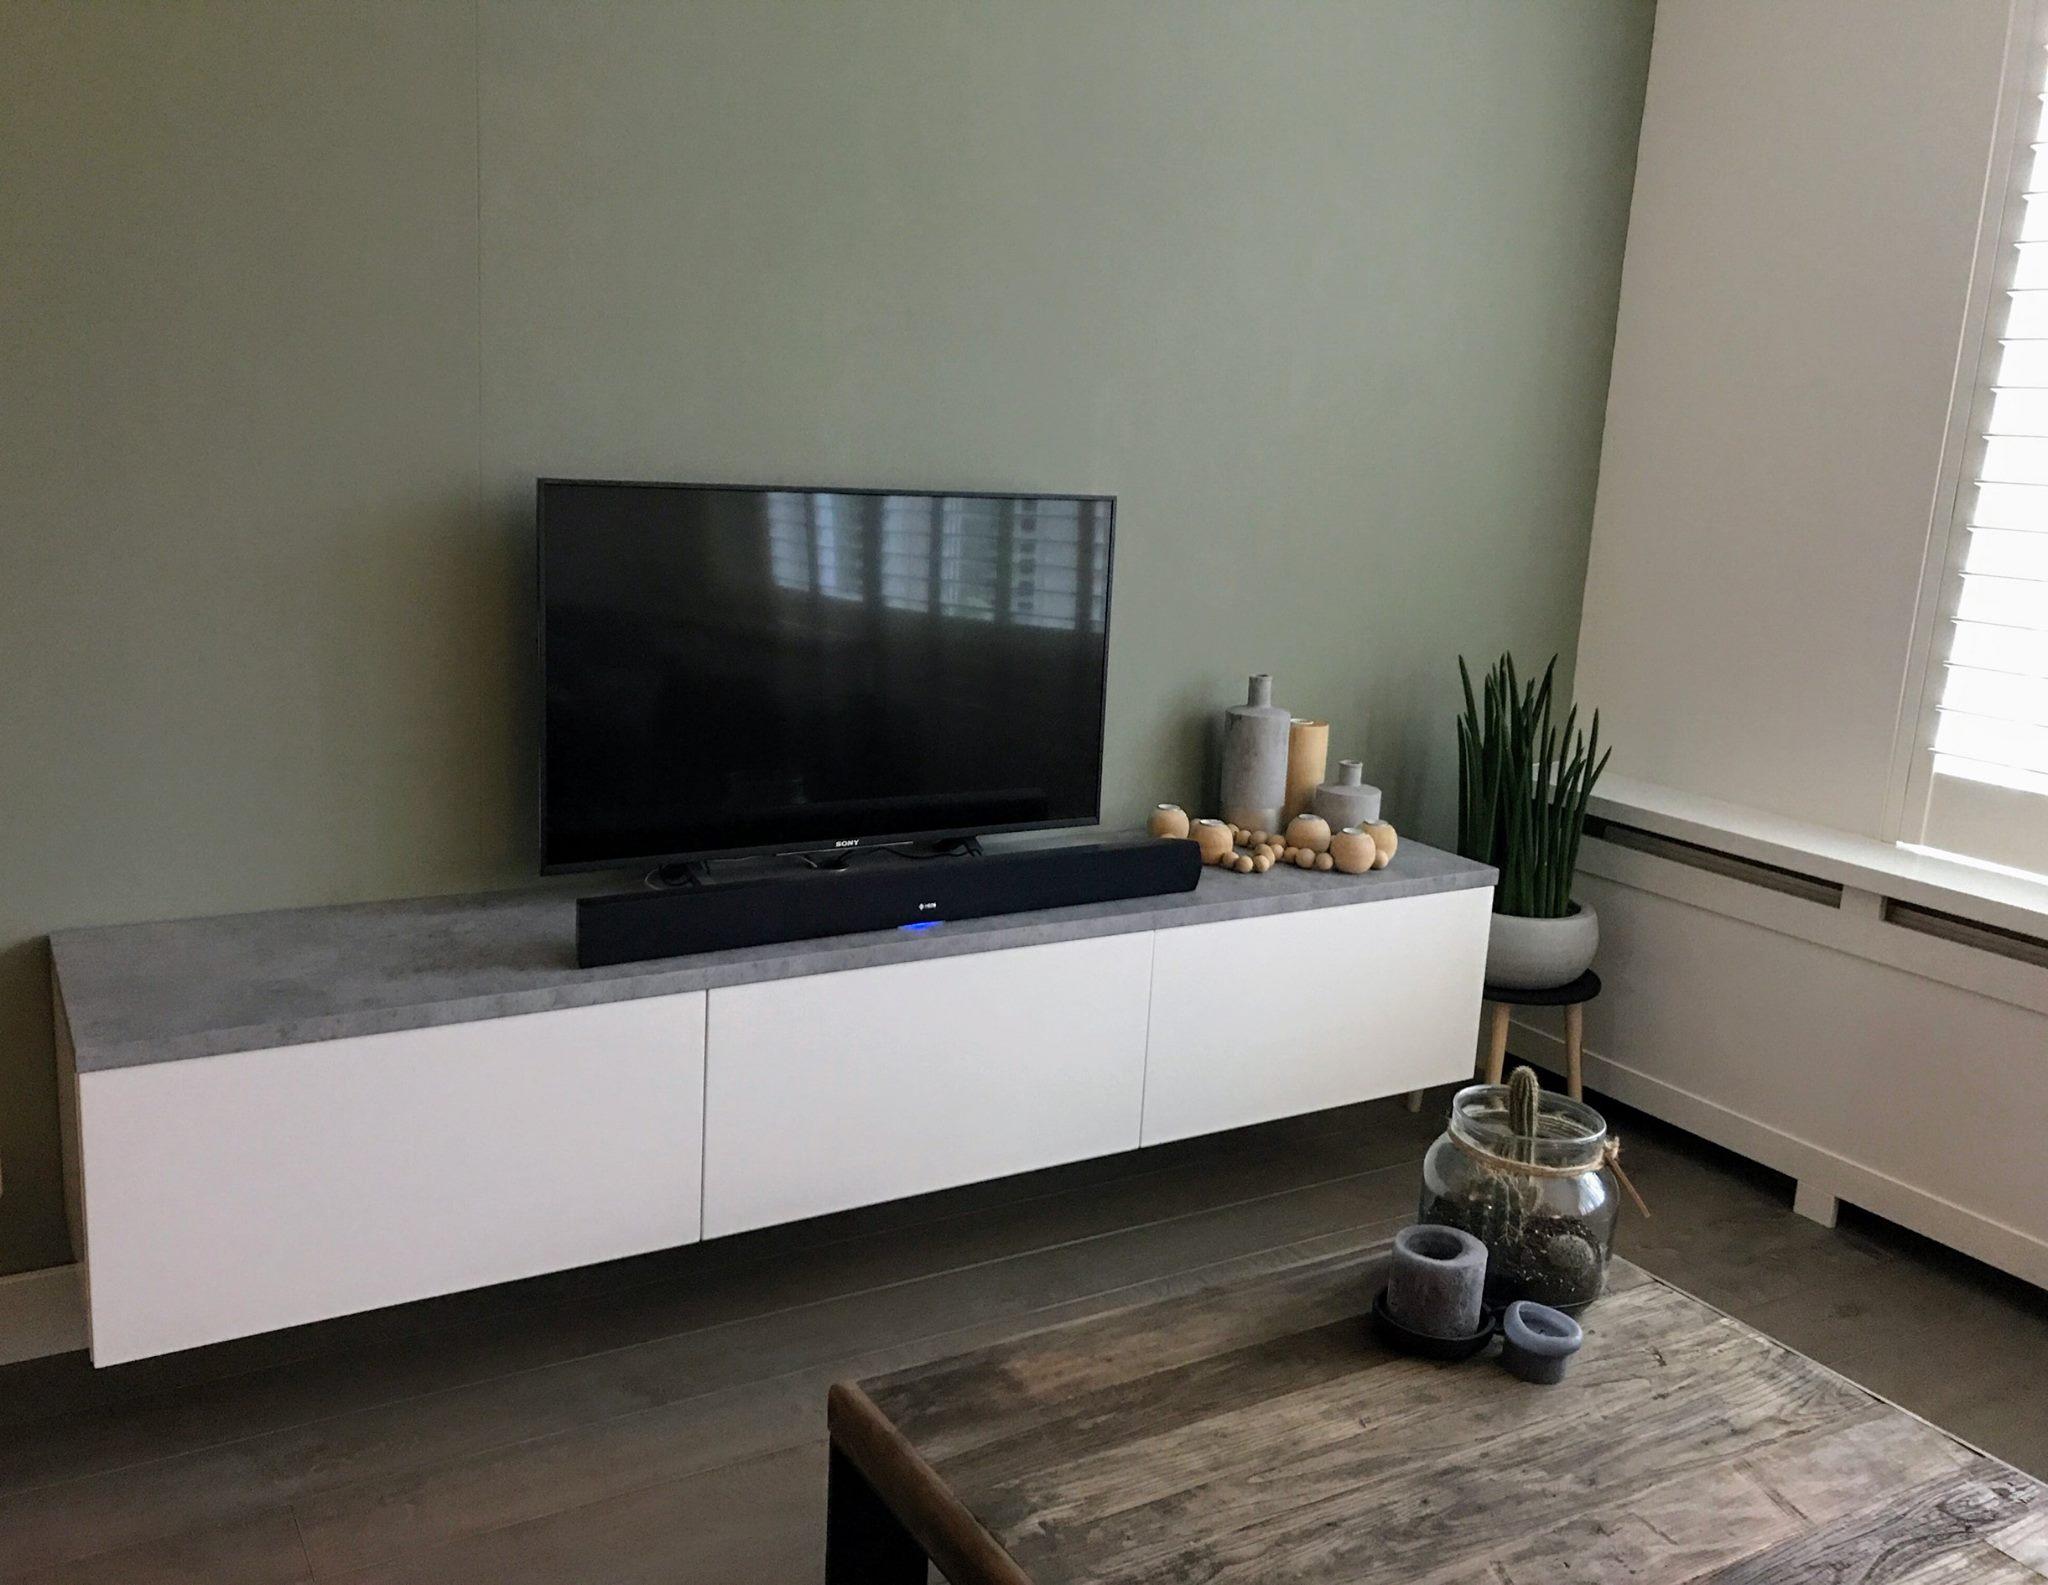 Zwevende Tv Meubels : Zwevend tv meubel maken tv meubel vision wit mdf kopen goossens